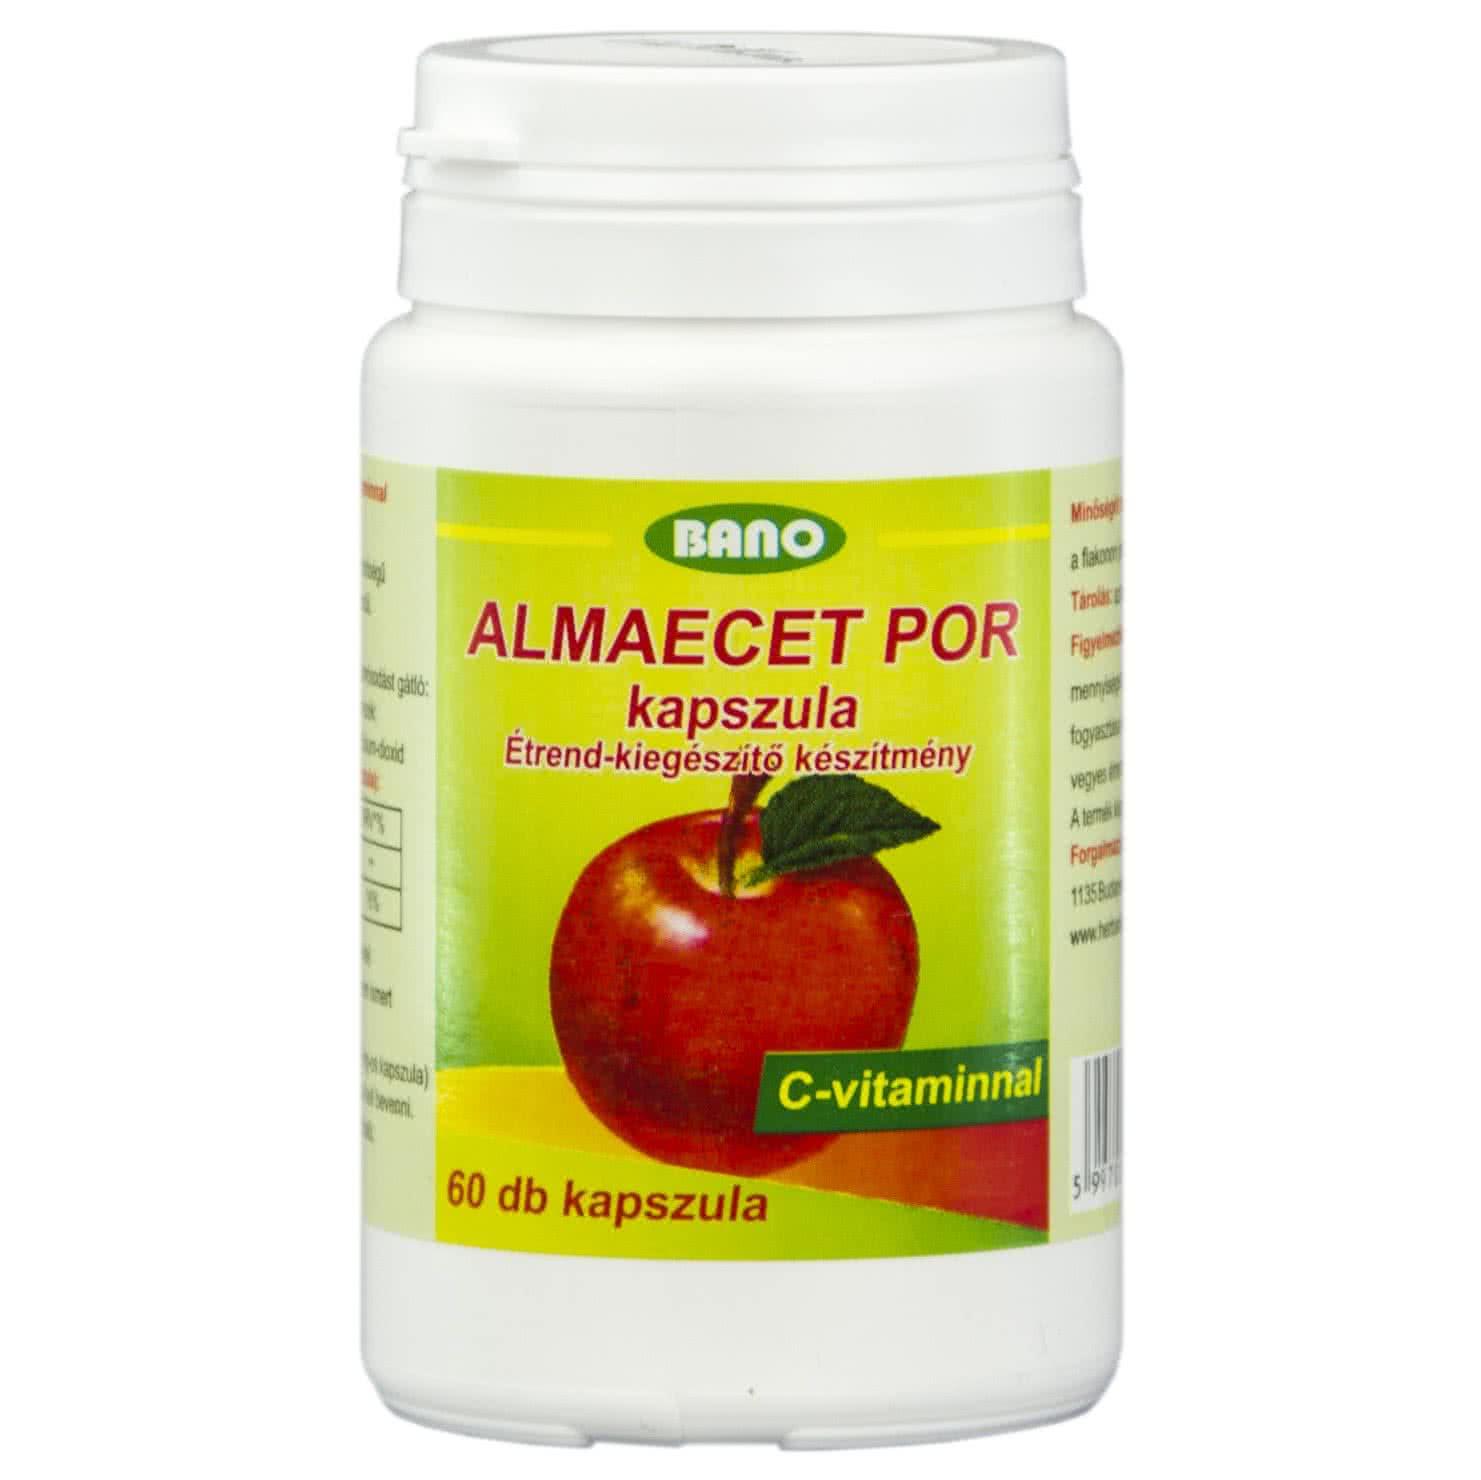 Bano Apple Cider Vinegar Caps 60 kaps